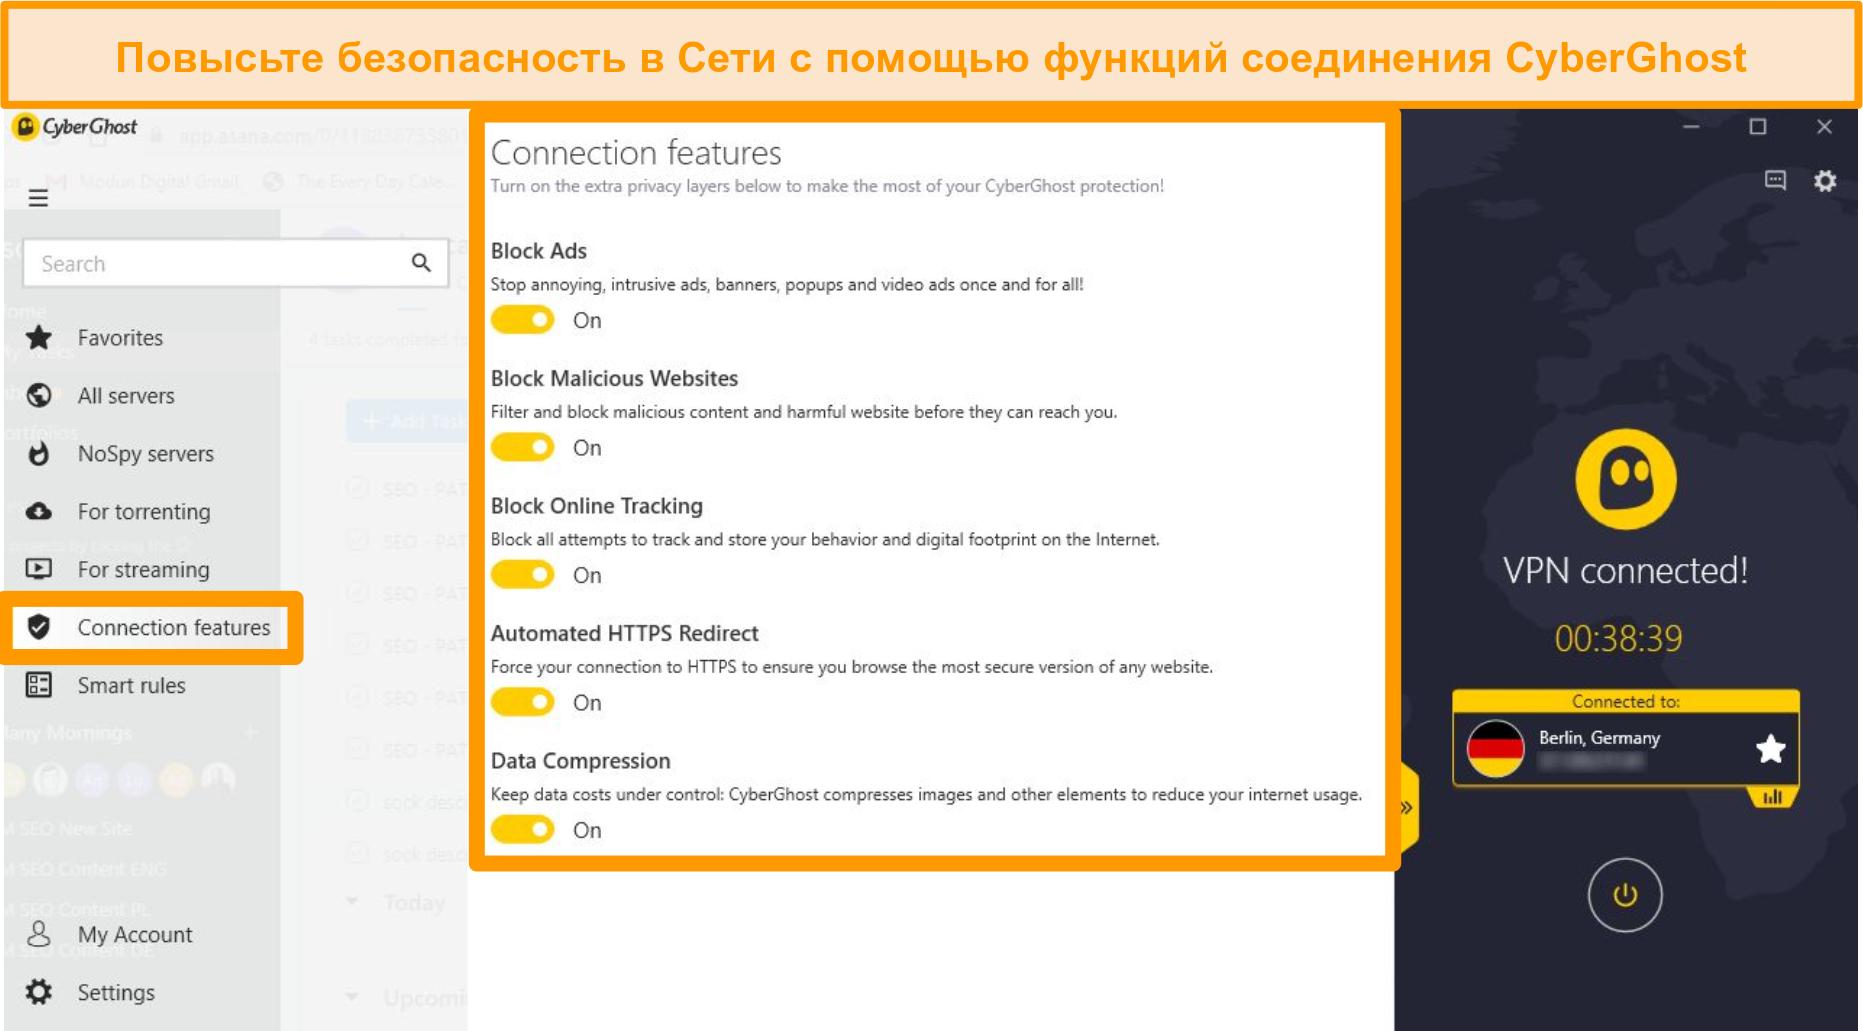 Снимок экрана с функциями подключения CyberGhost для повышения безопасности в Интернете